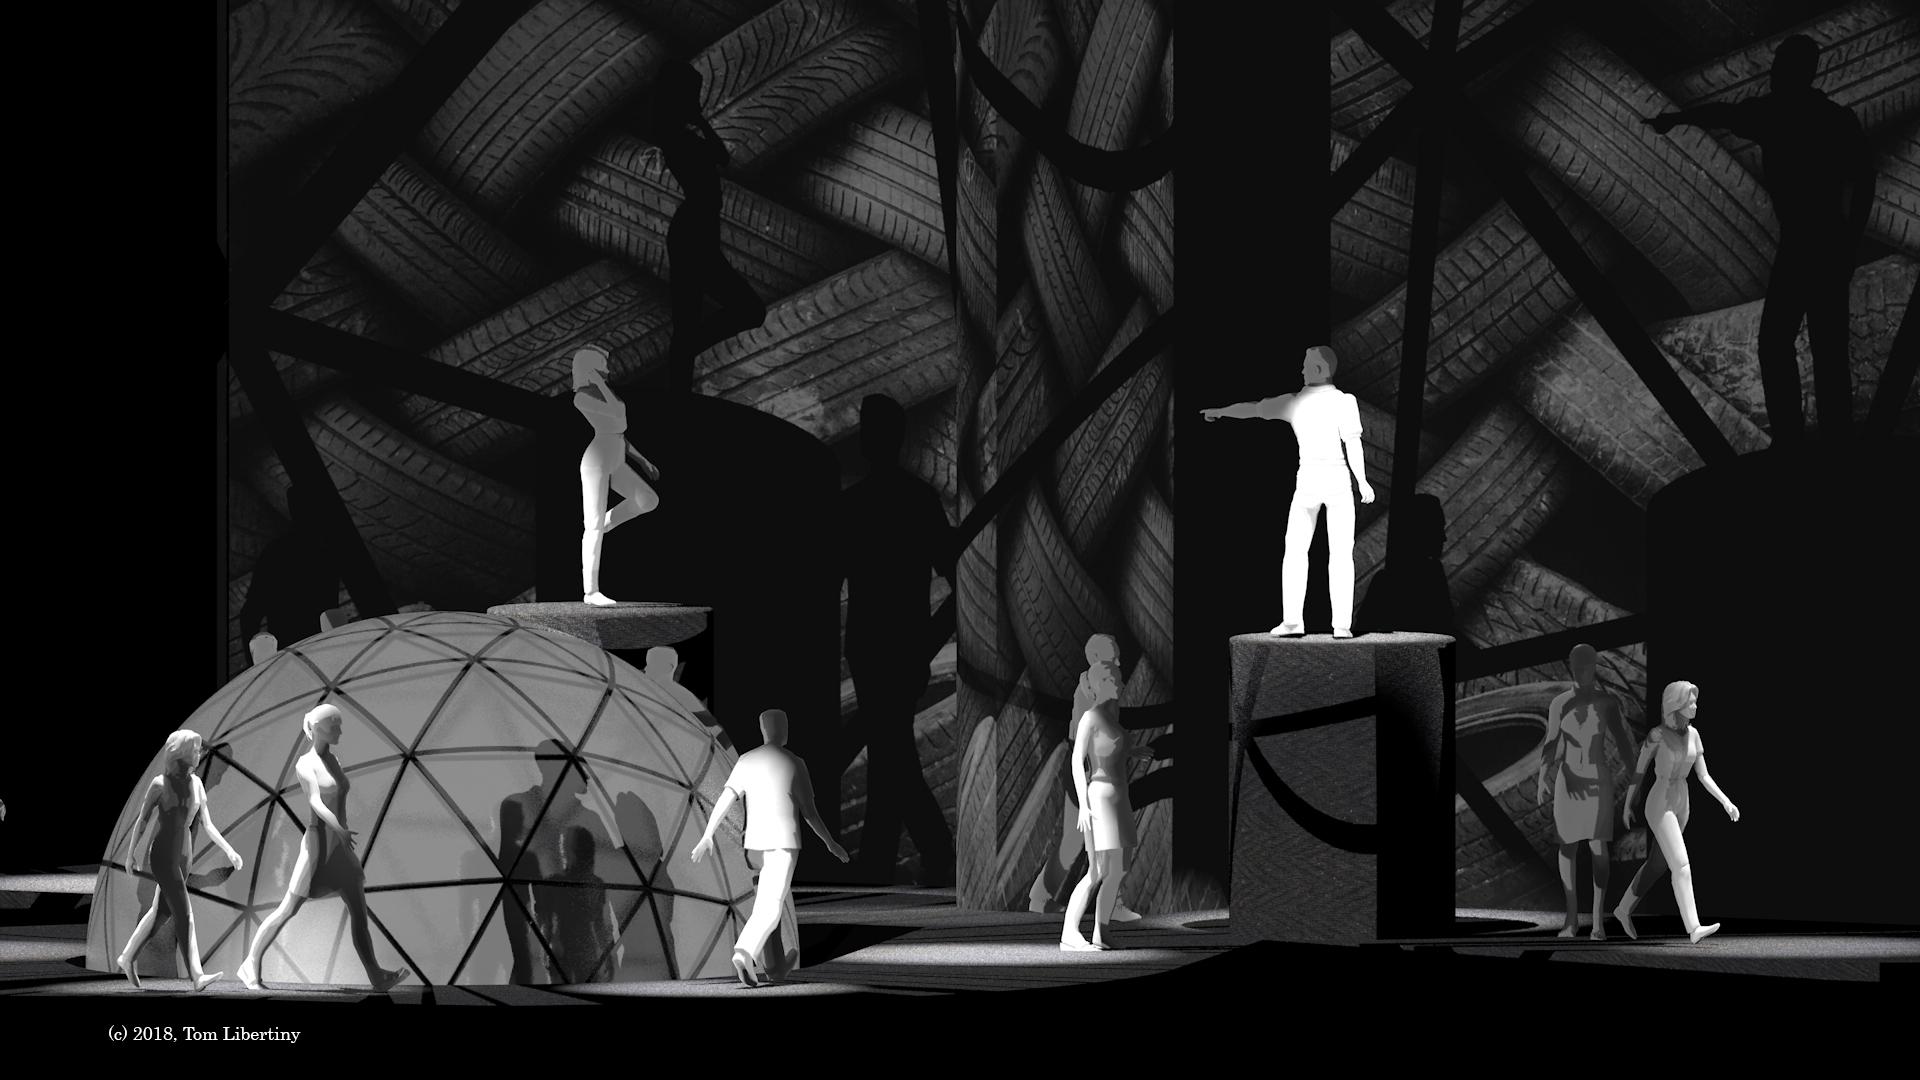 Ankh Concept Concept | Tom Libertiny Visualization artist | Daira Zhestyreva